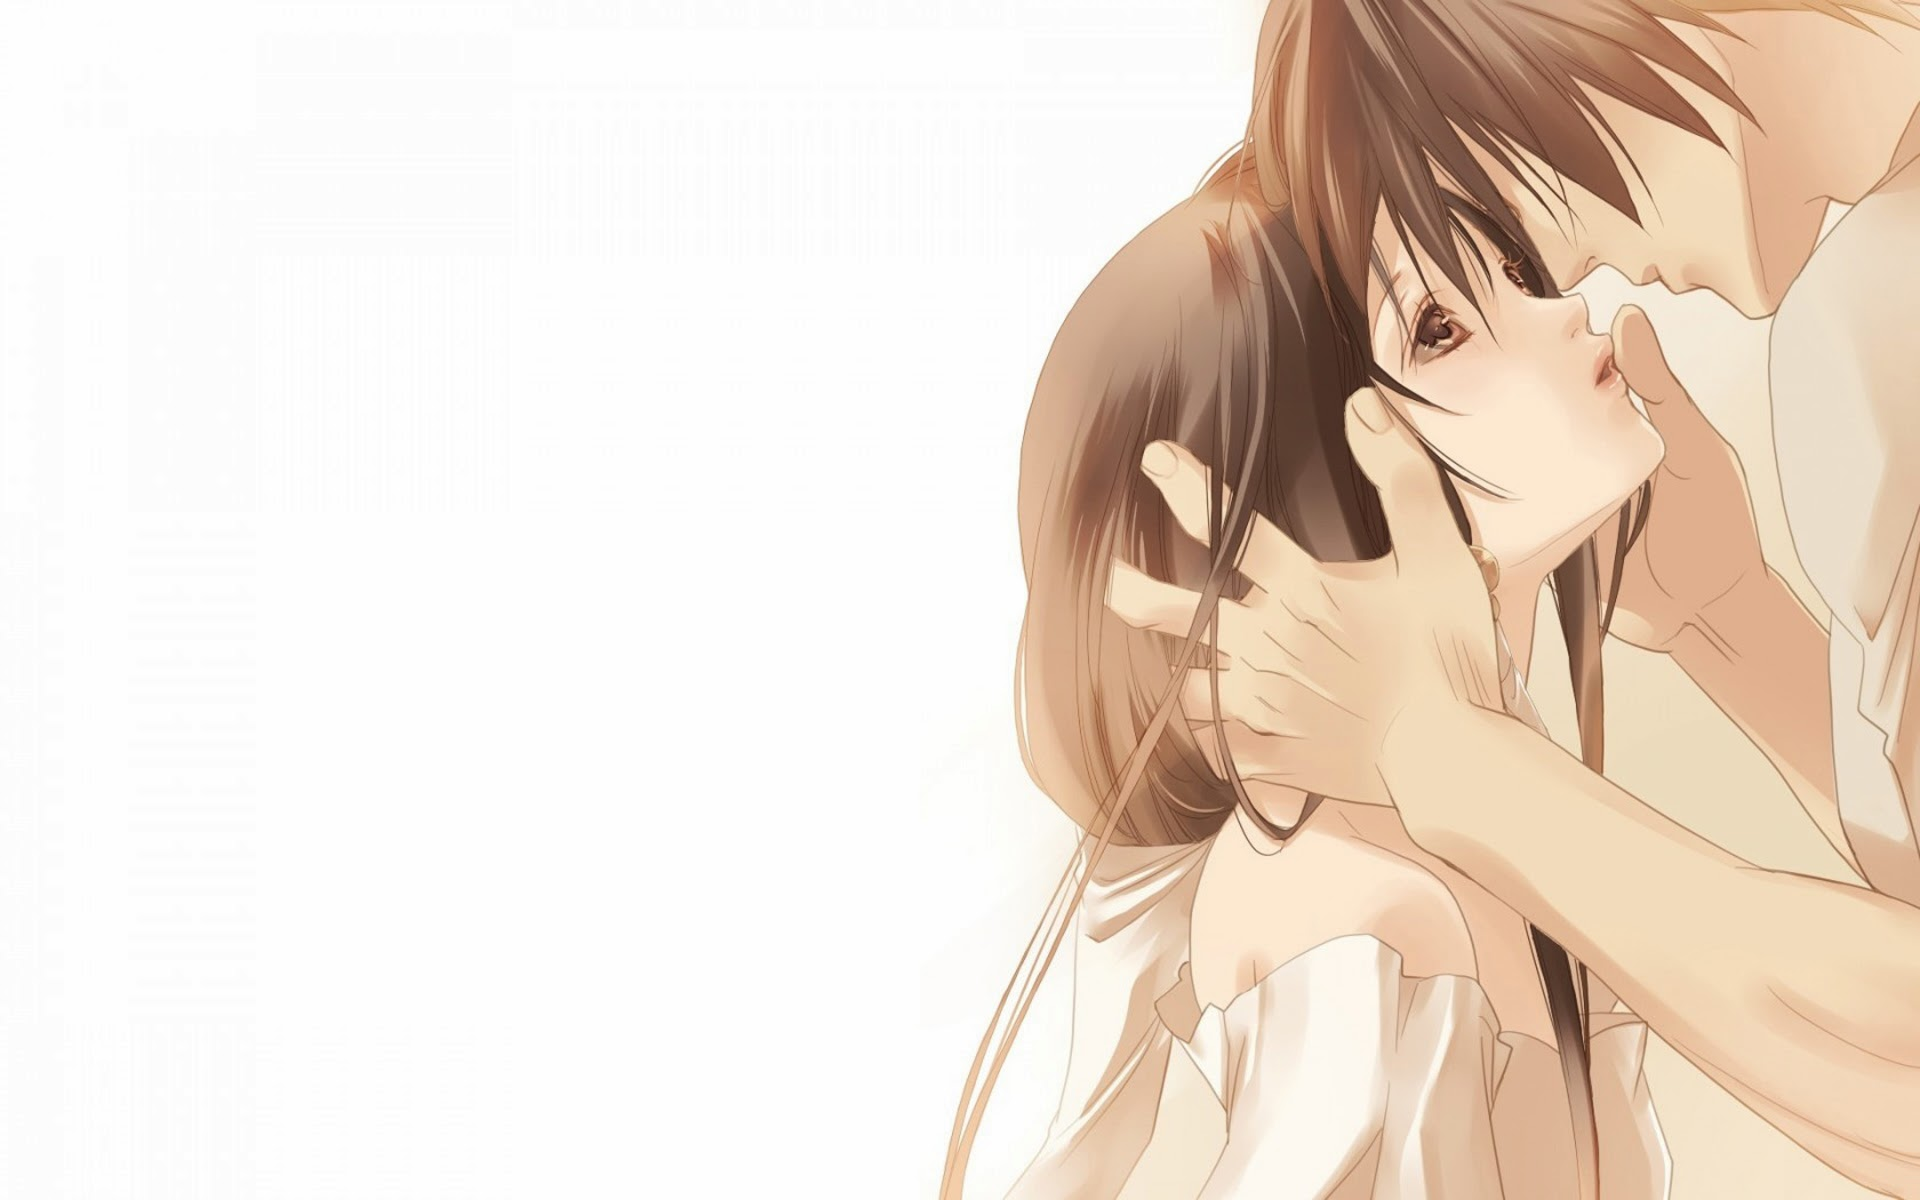 sweet anime couple hd wallpaper 1680x1050 1920x1200